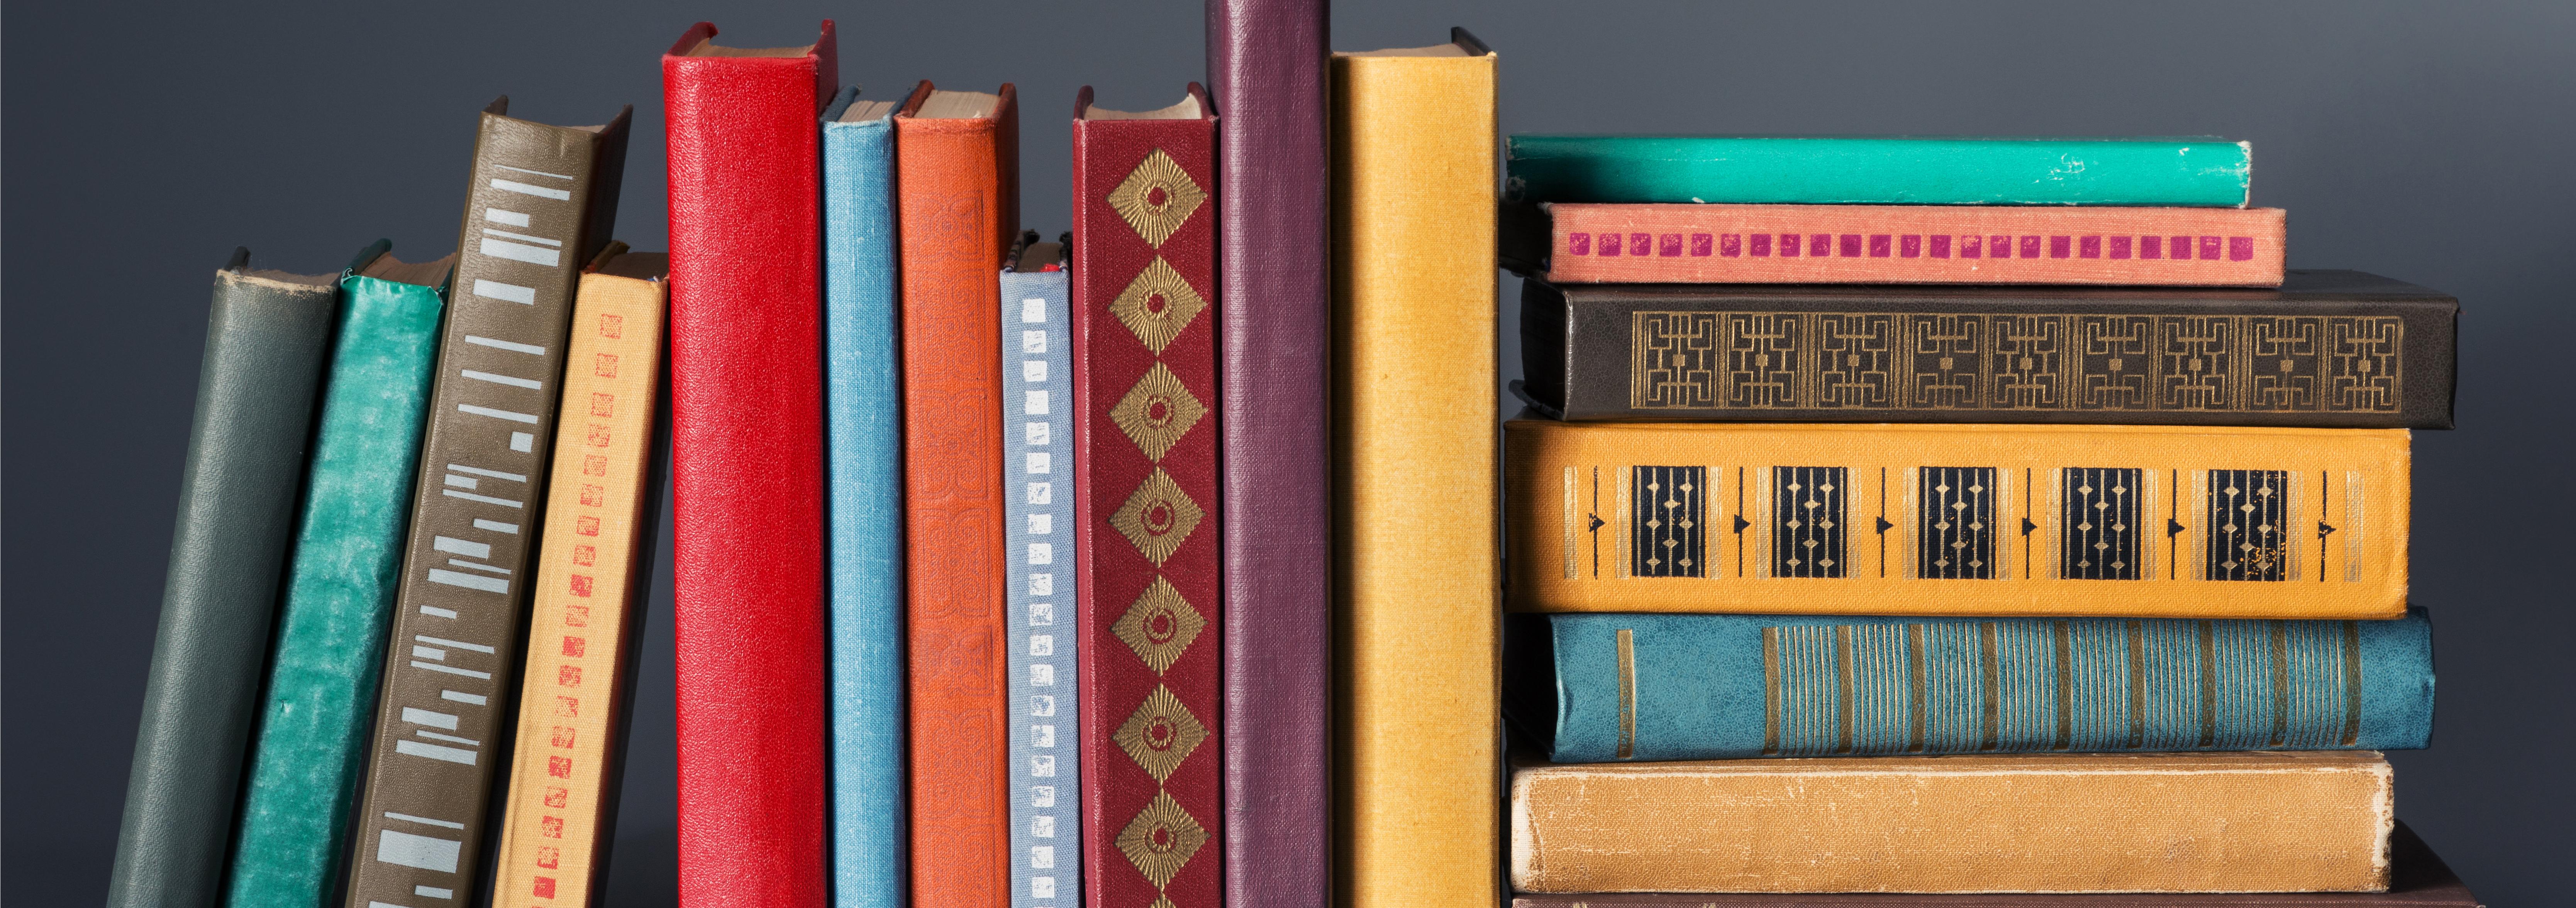 5 Brilliant Ways To Organize Your Bookshelf